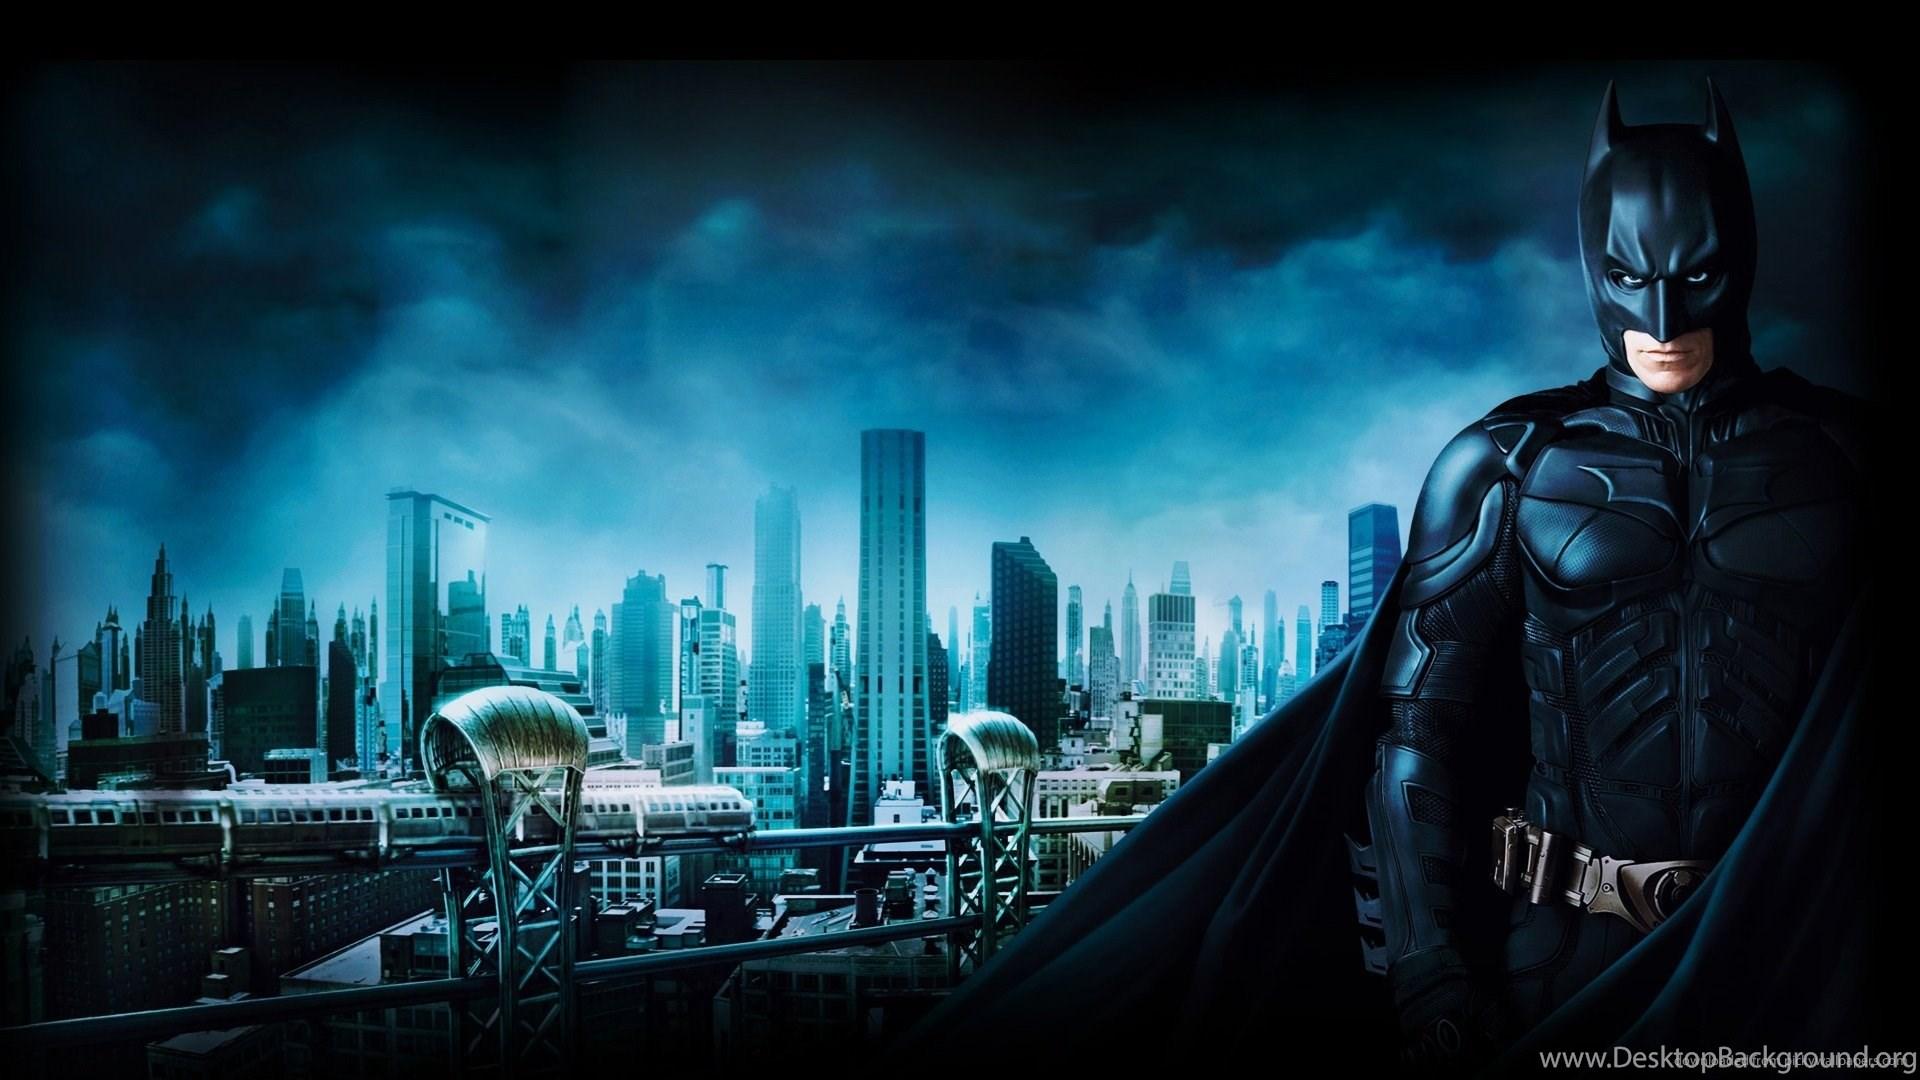 Download 1920x1080 Batman 3 Gotham City Wallpapers Desktop Background